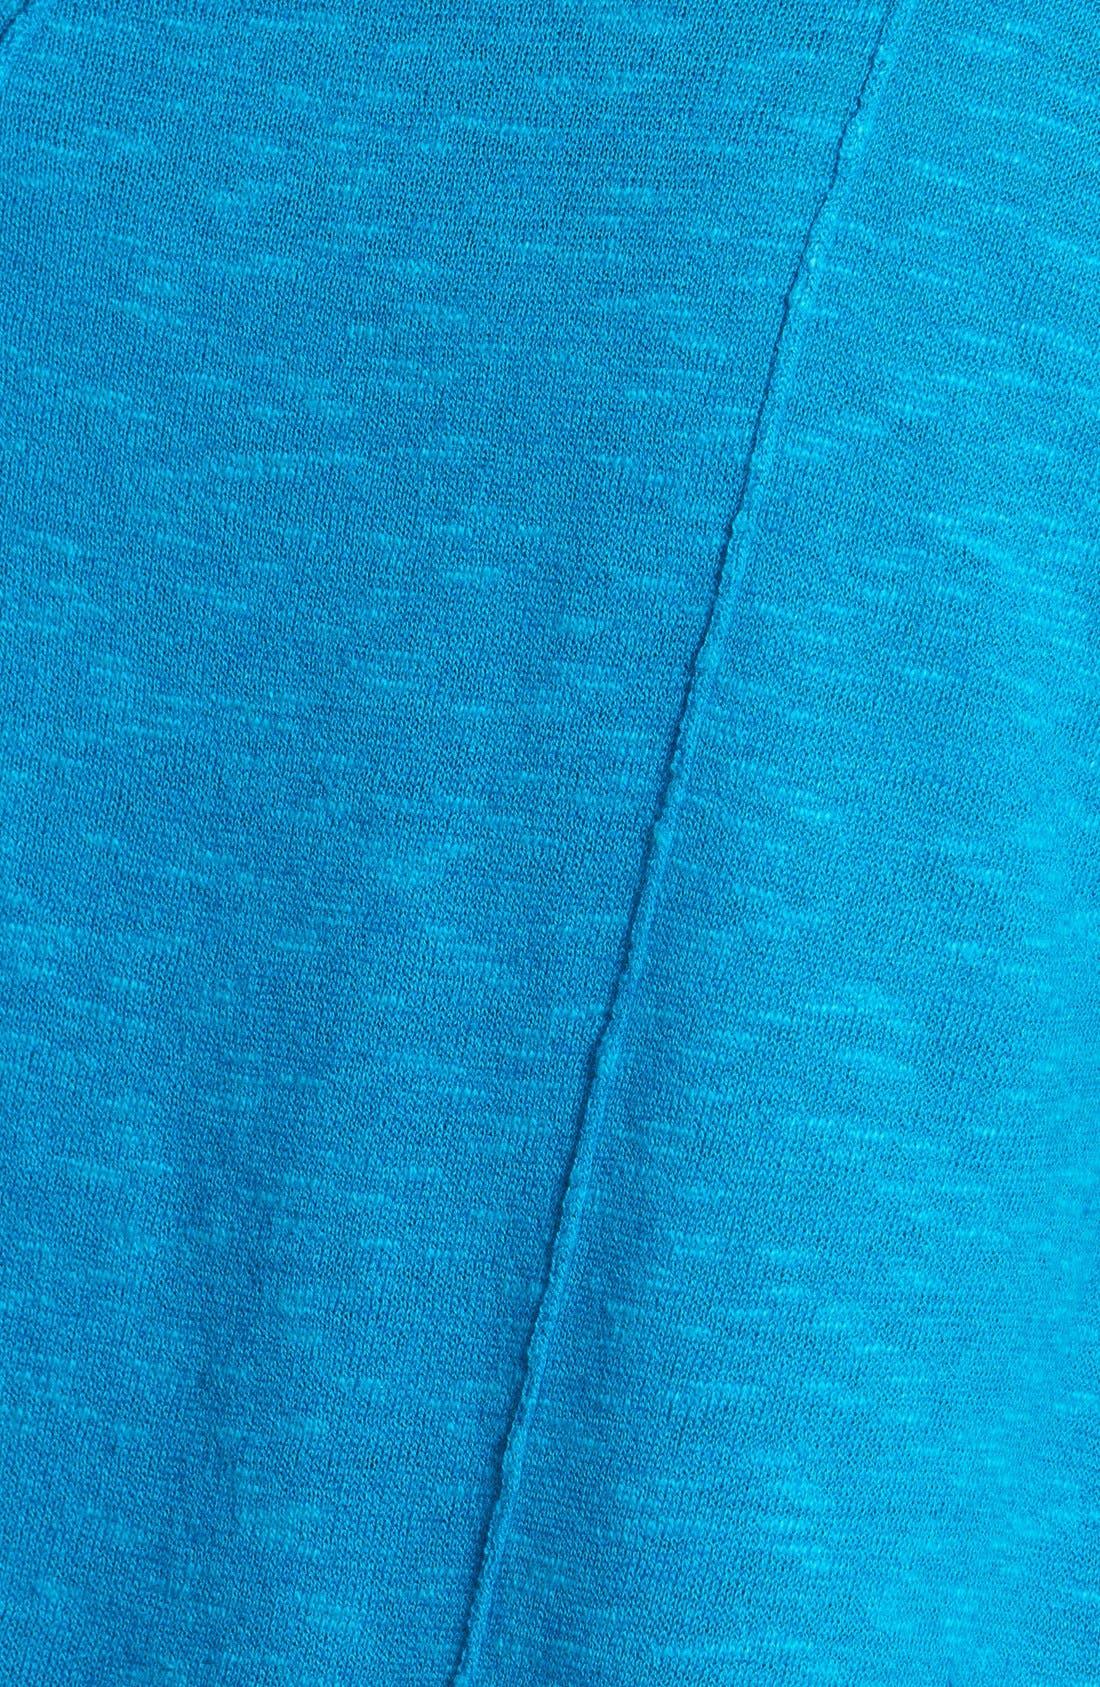 Cap Sleeve Organic Linen & Cotton Scoop Neck Top,                             Alternate thumbnail 31, color,